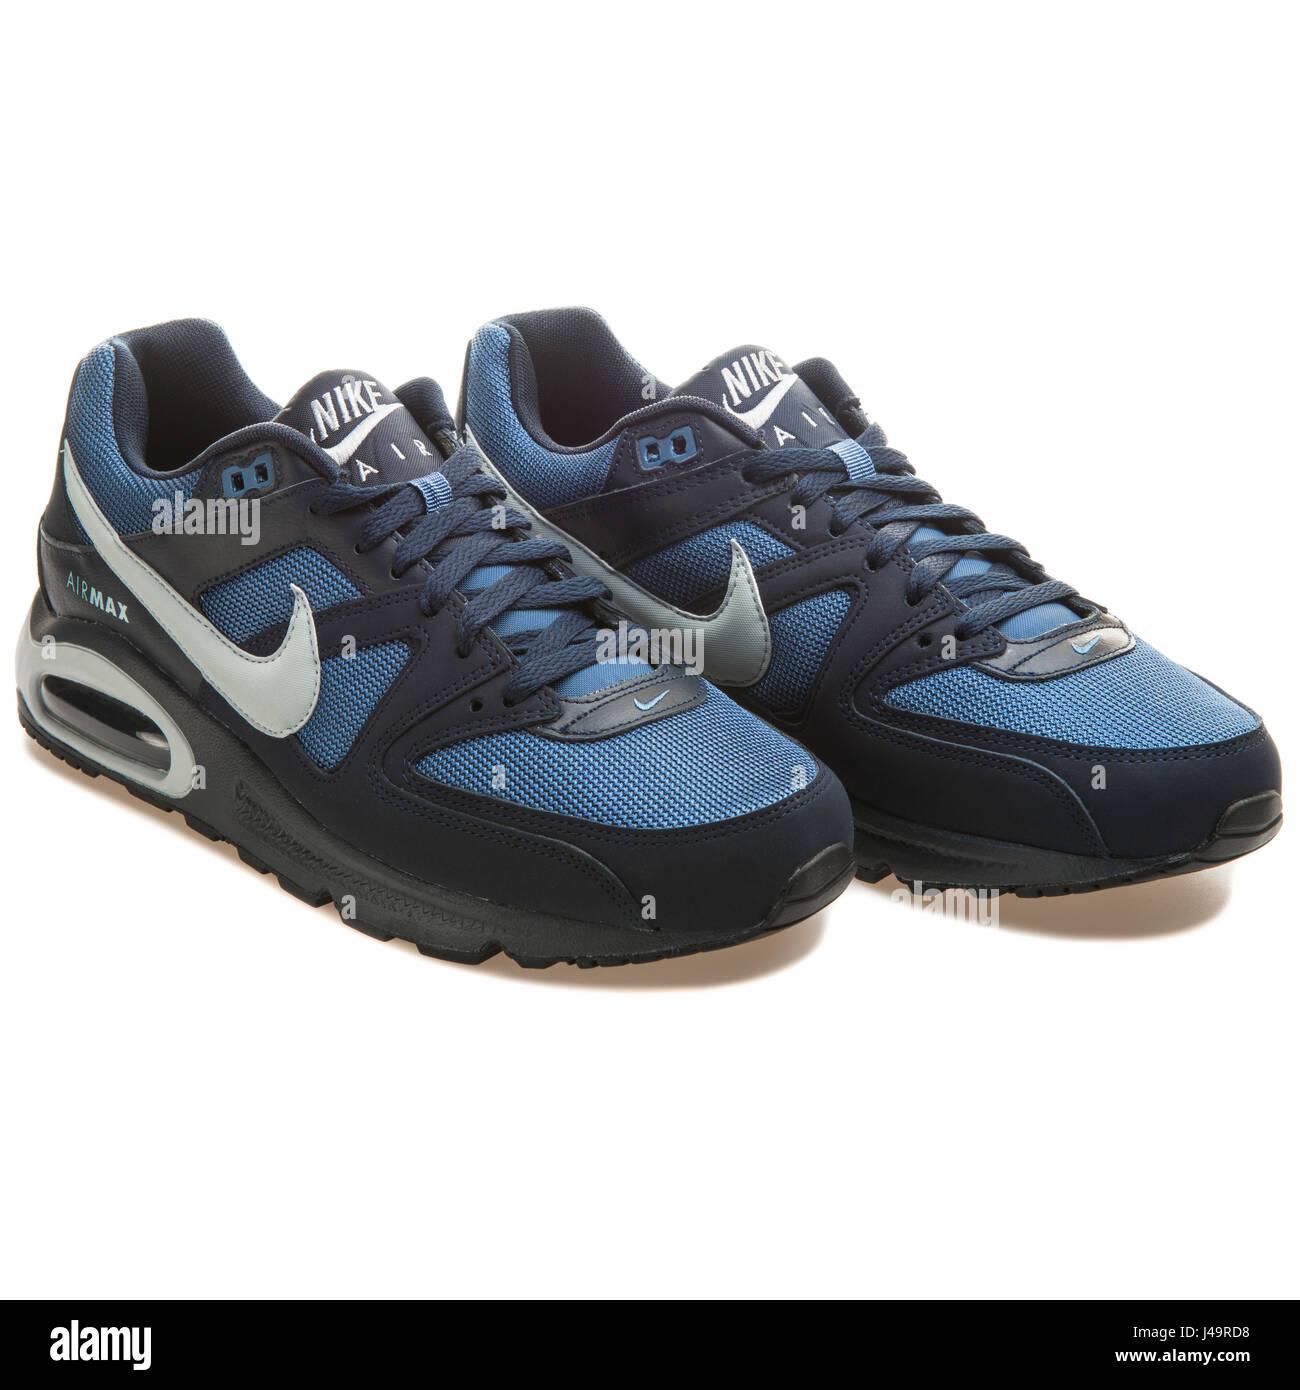 Nike Air Max Command blu 629993 400 Foto & Immagine Stock